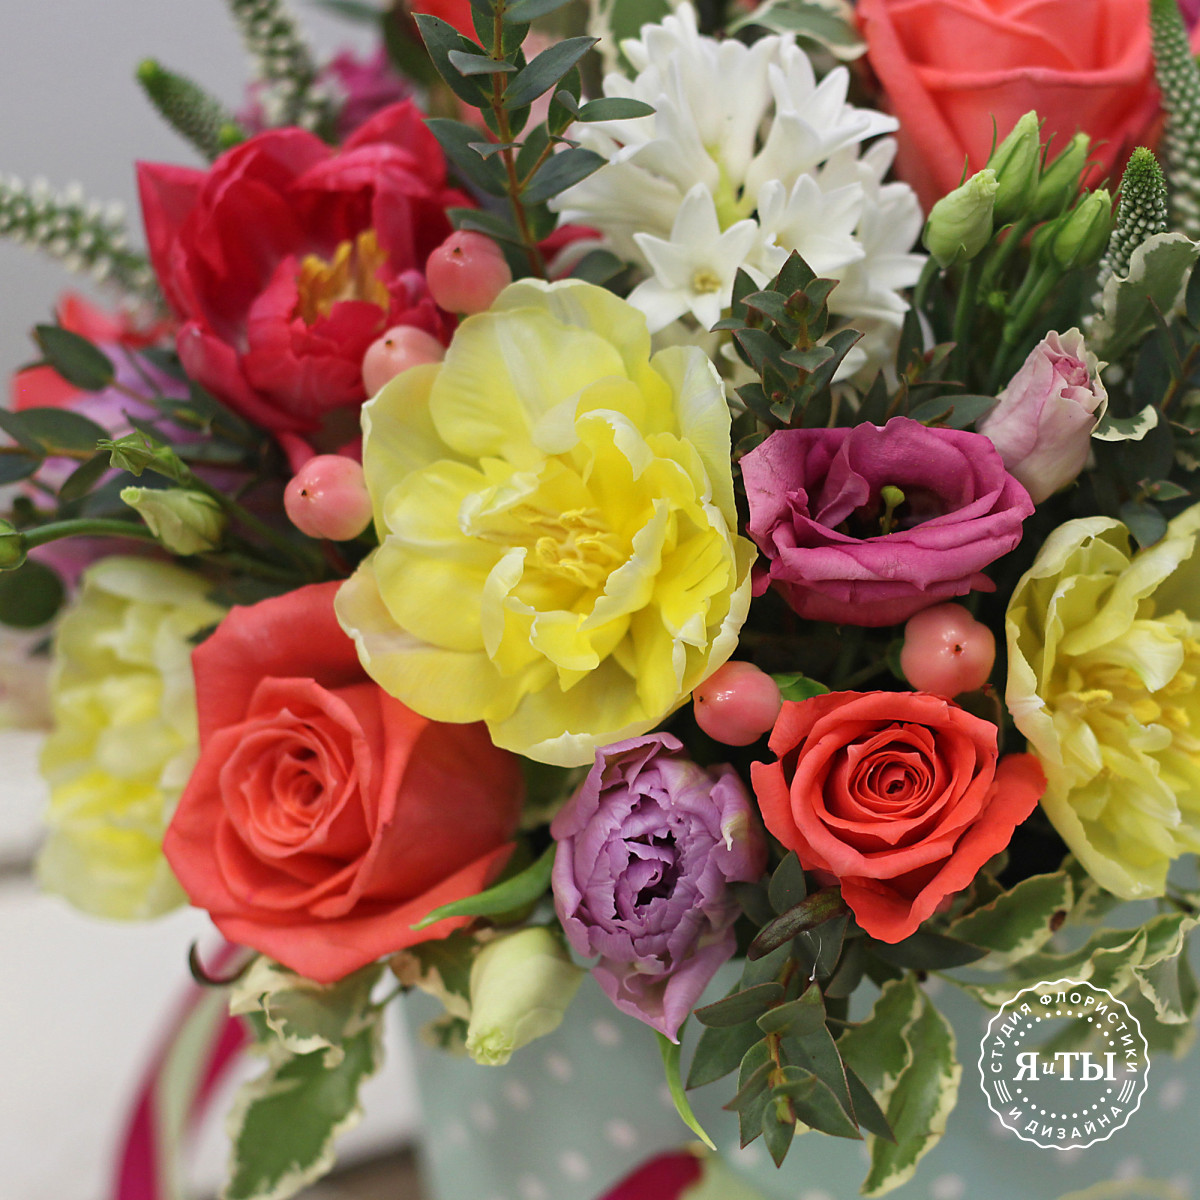 Яркая весенняя коробочка с тюльпанами